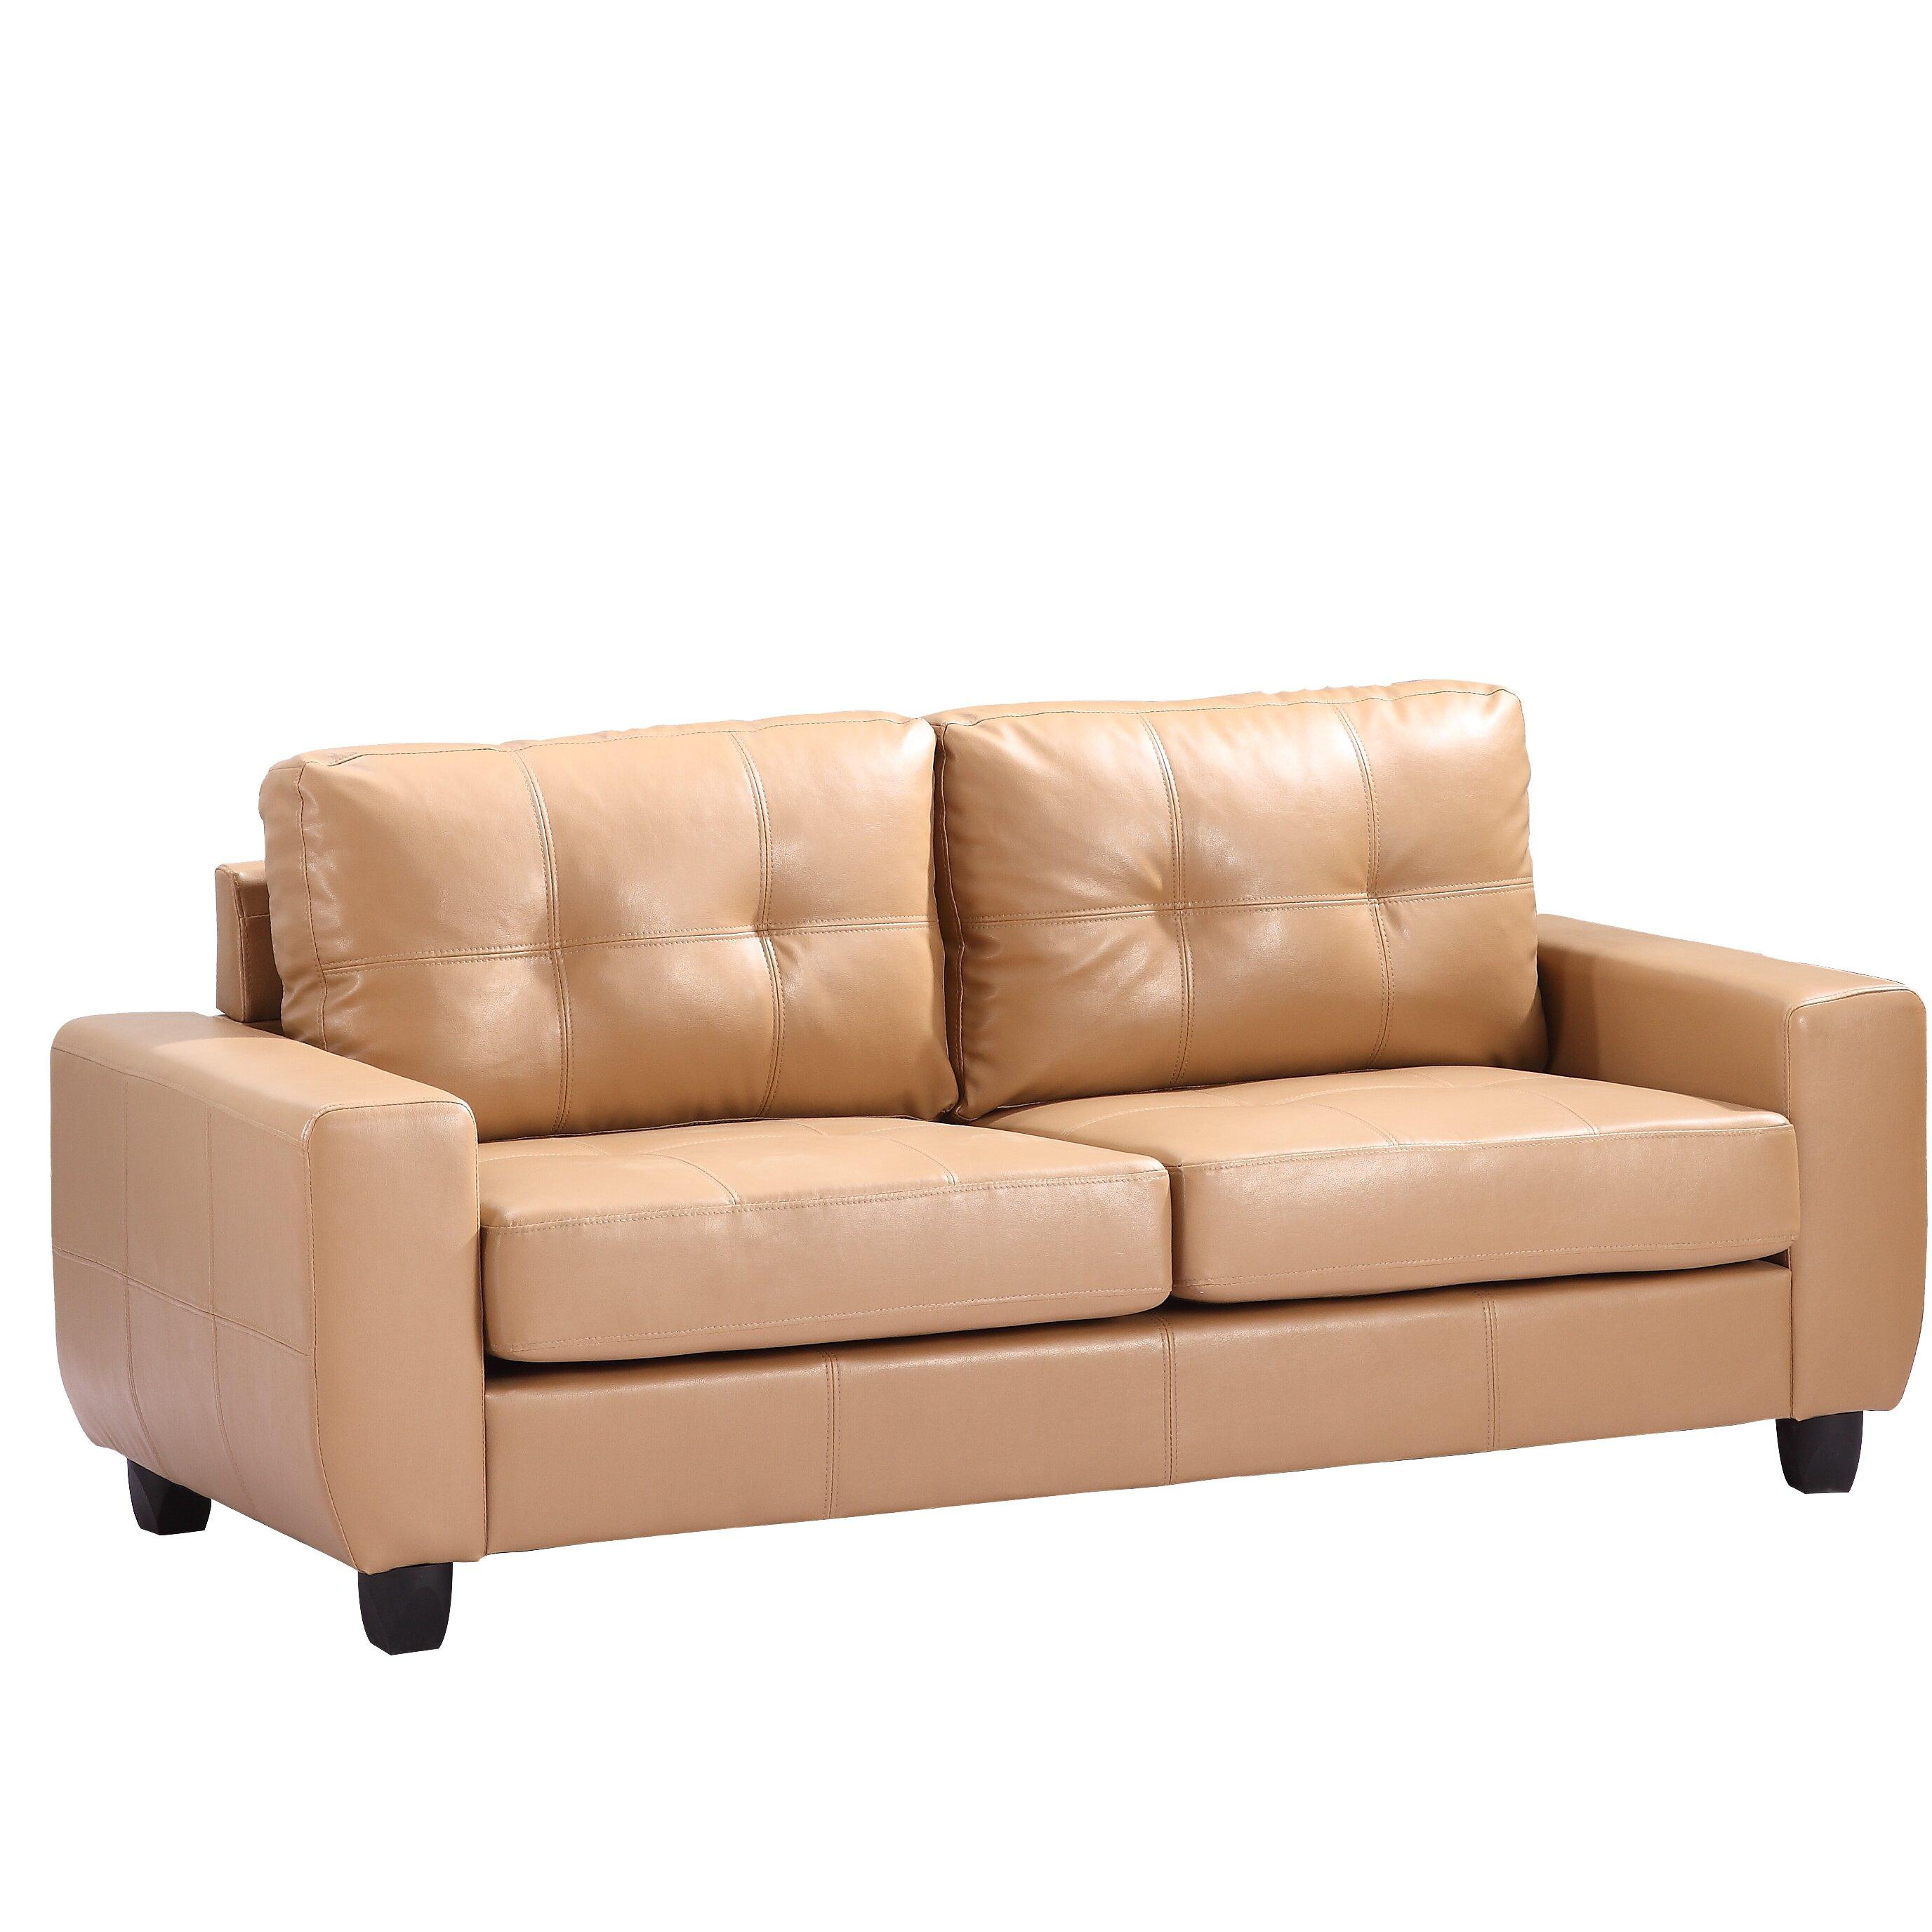 Glory furniture lina sofa reviews wayfair for I furniture reviews